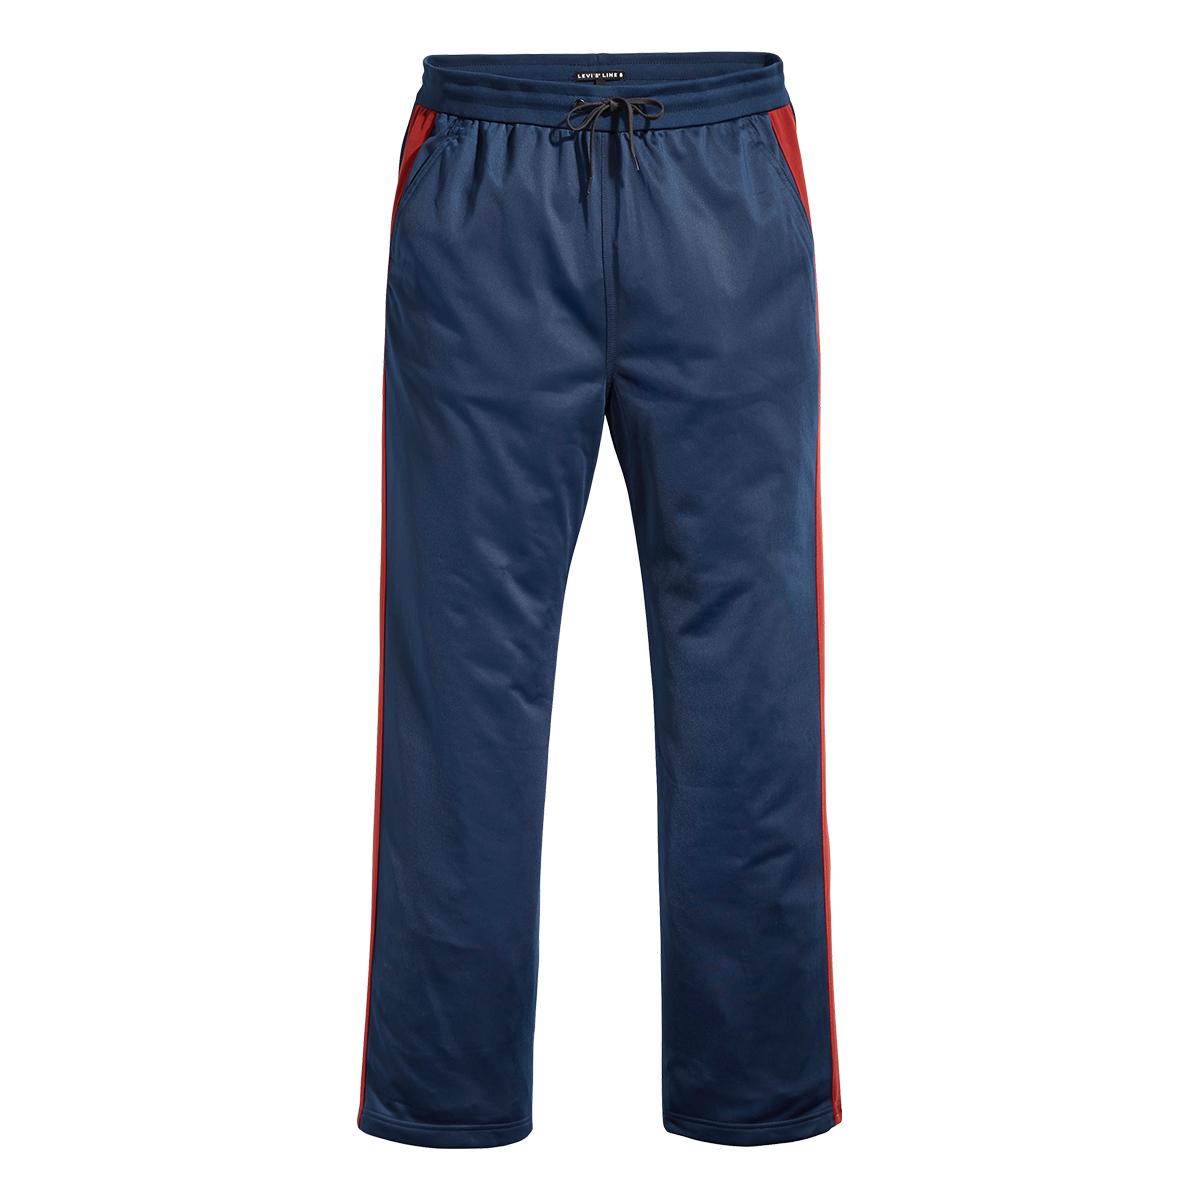 Levi's AW17 Sweatpants